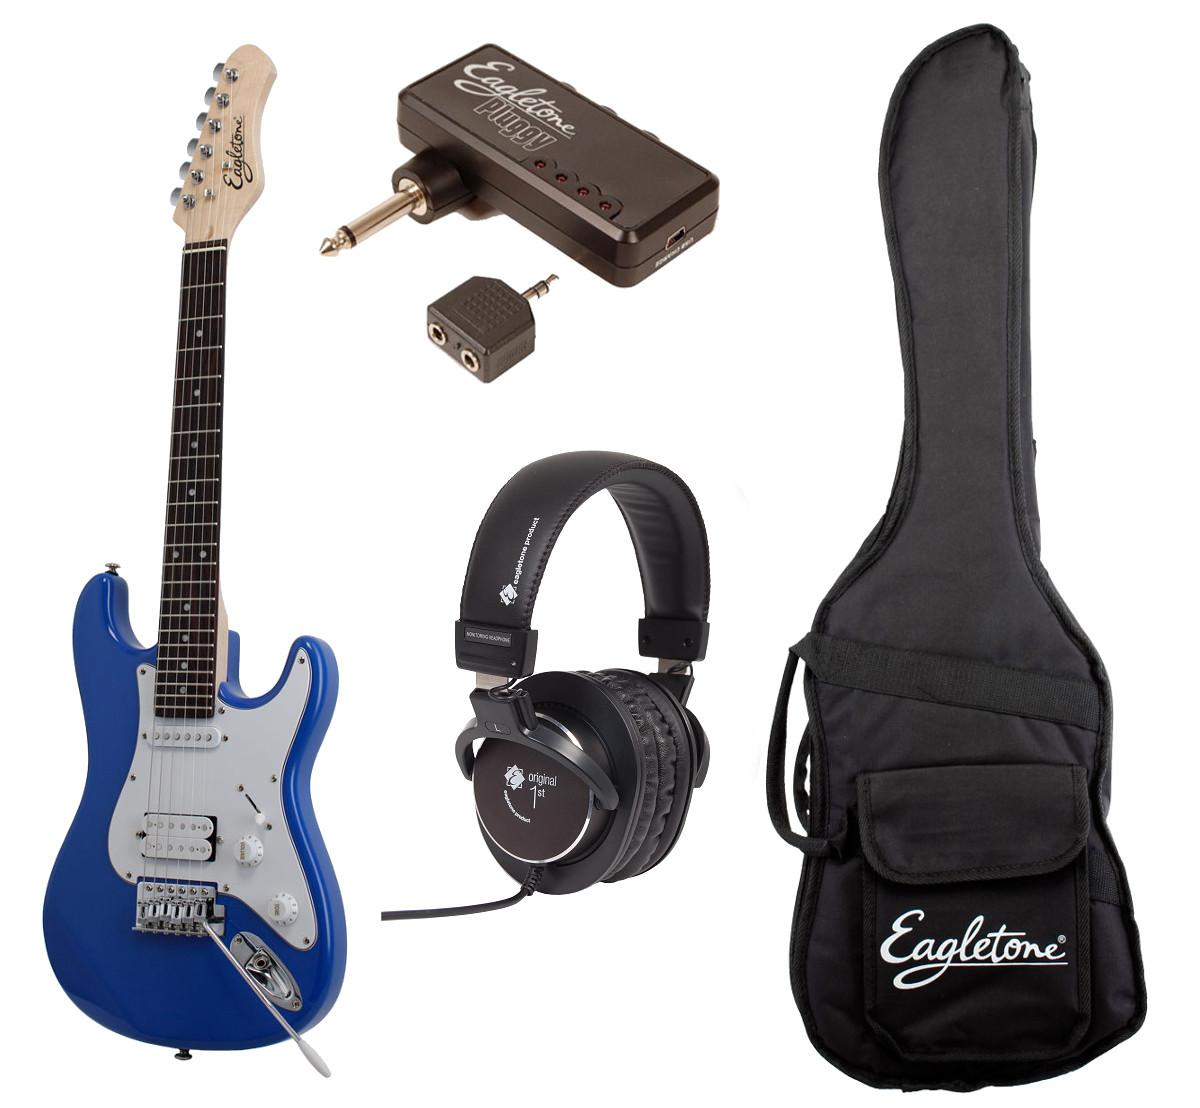 Eagletone Sun State Mini Bleue + Pluggy + Original First